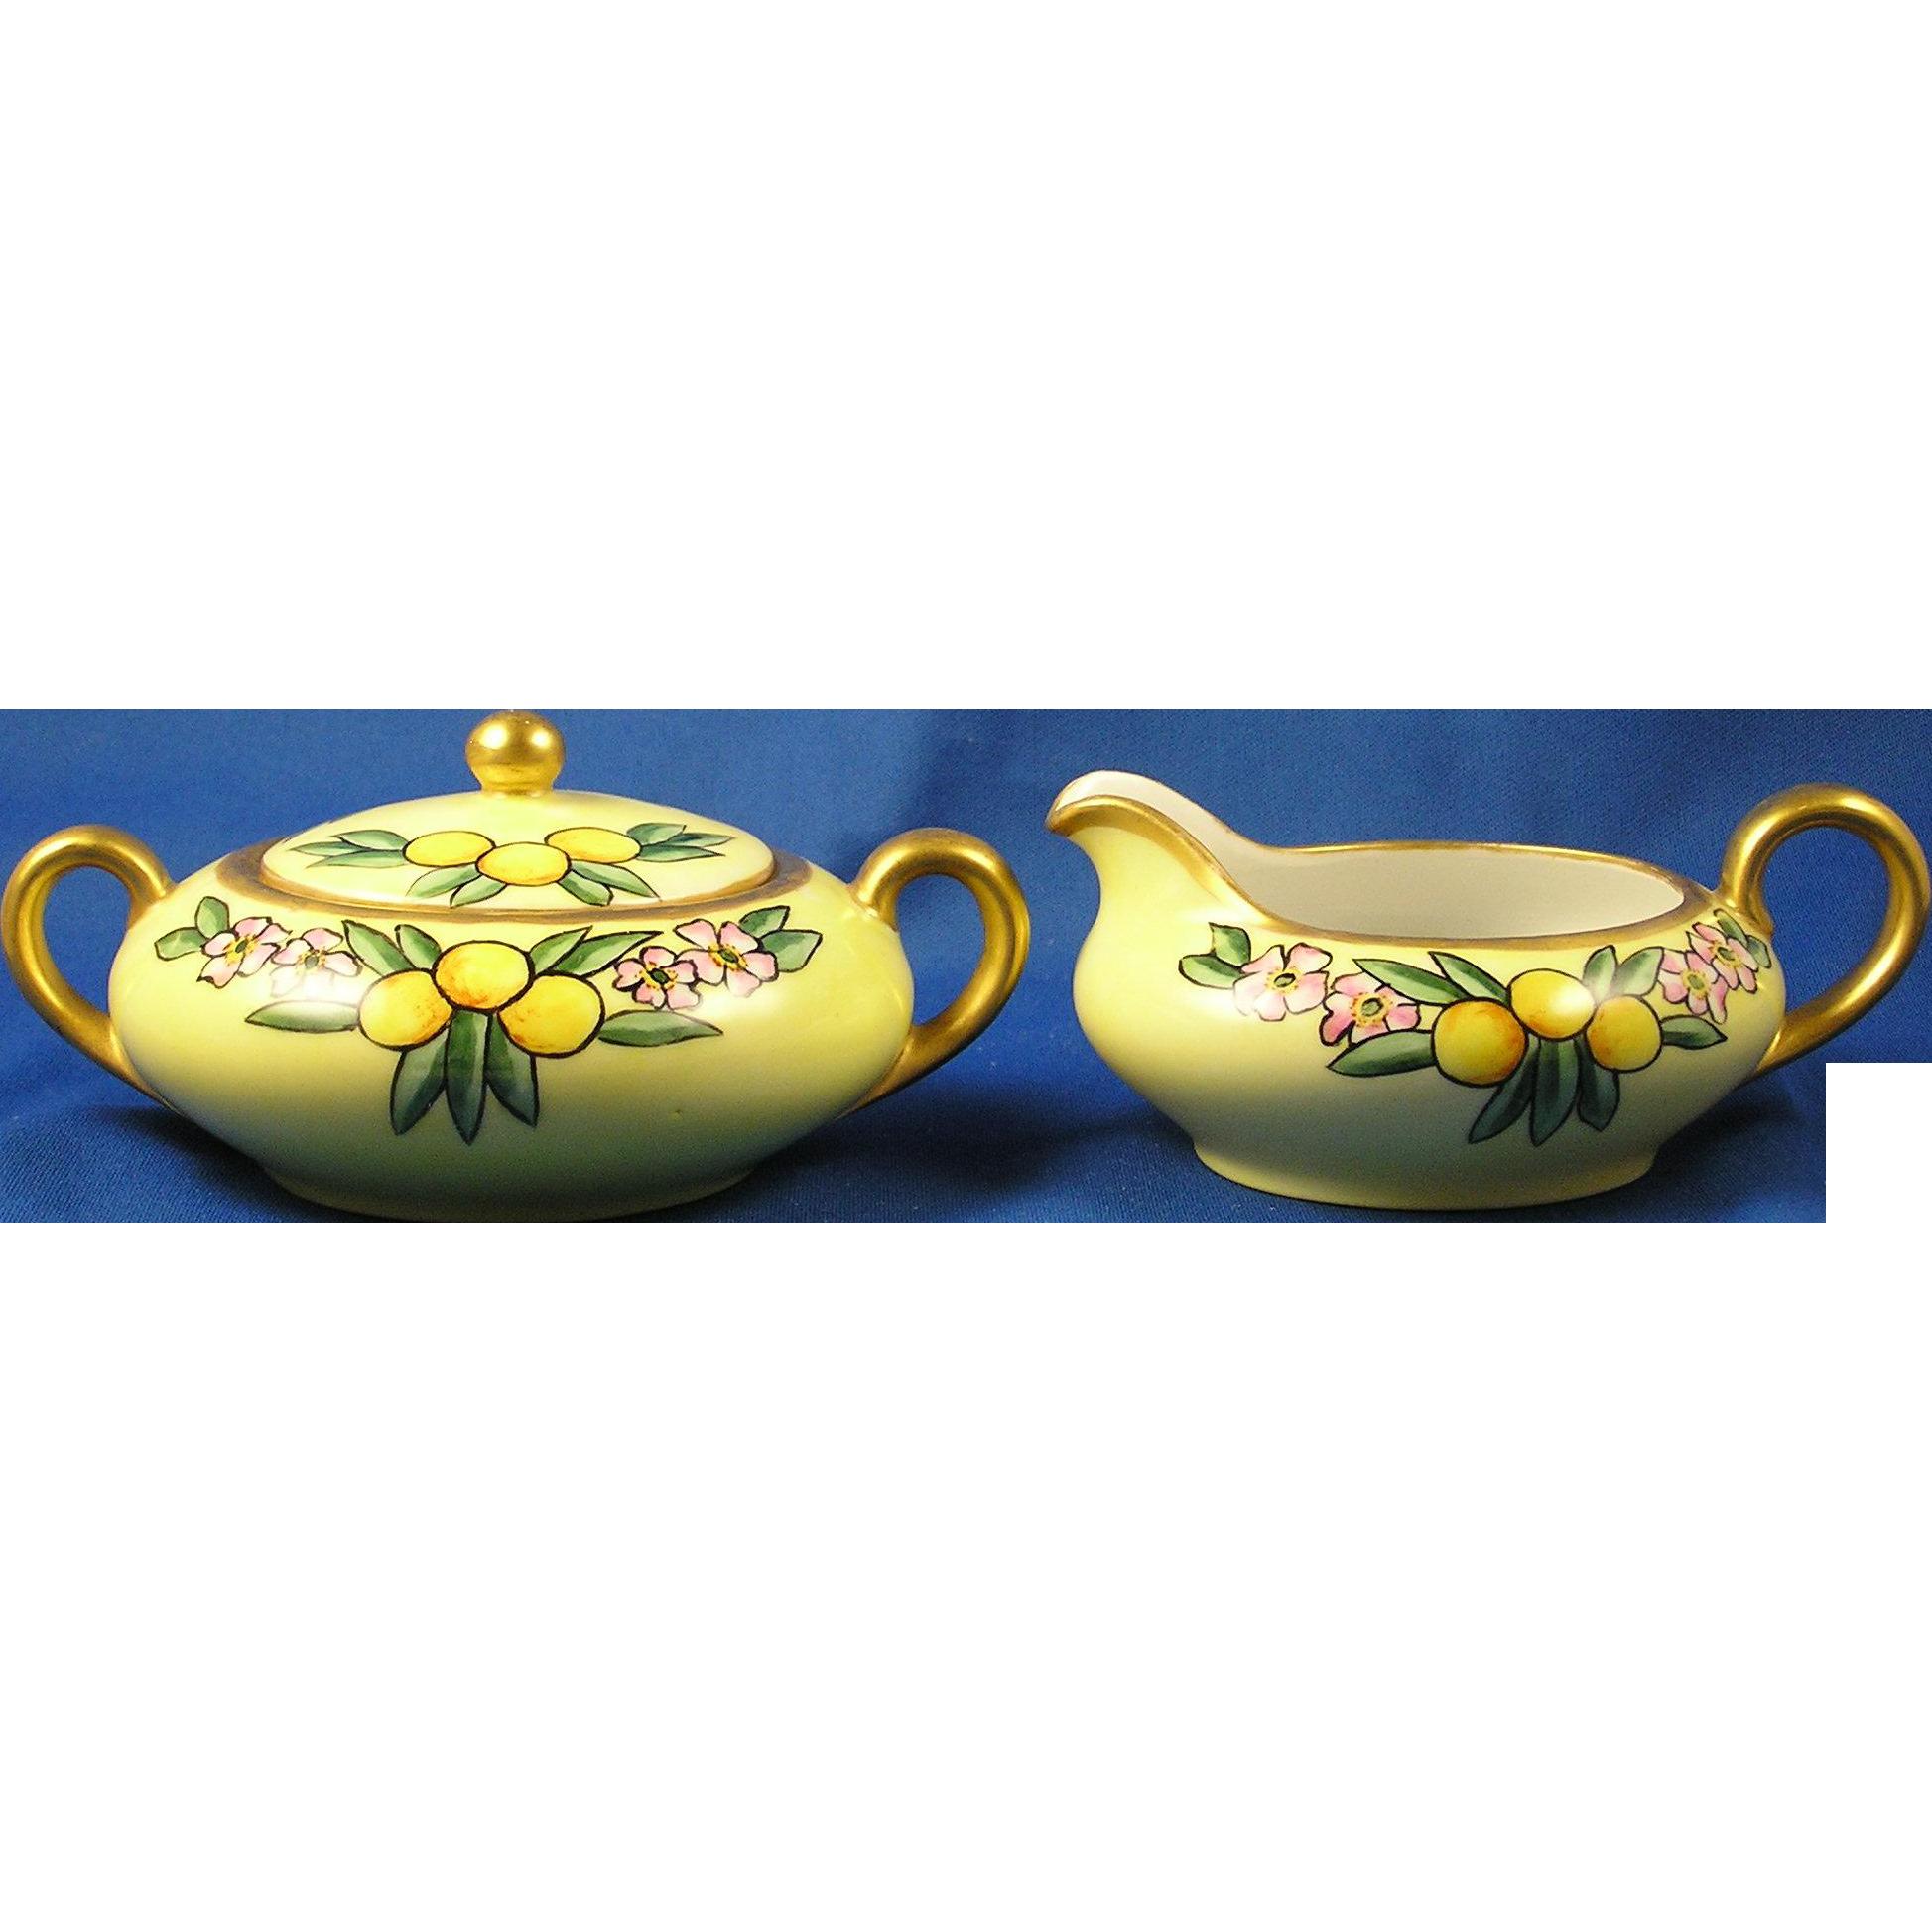 "Oscar & Edgar Gutherz (O&EG) Austria Arts & Crafts Citrus Motif Creamer & Sugar Set (Signed ""M. Hickman""/c.1899-1918)"